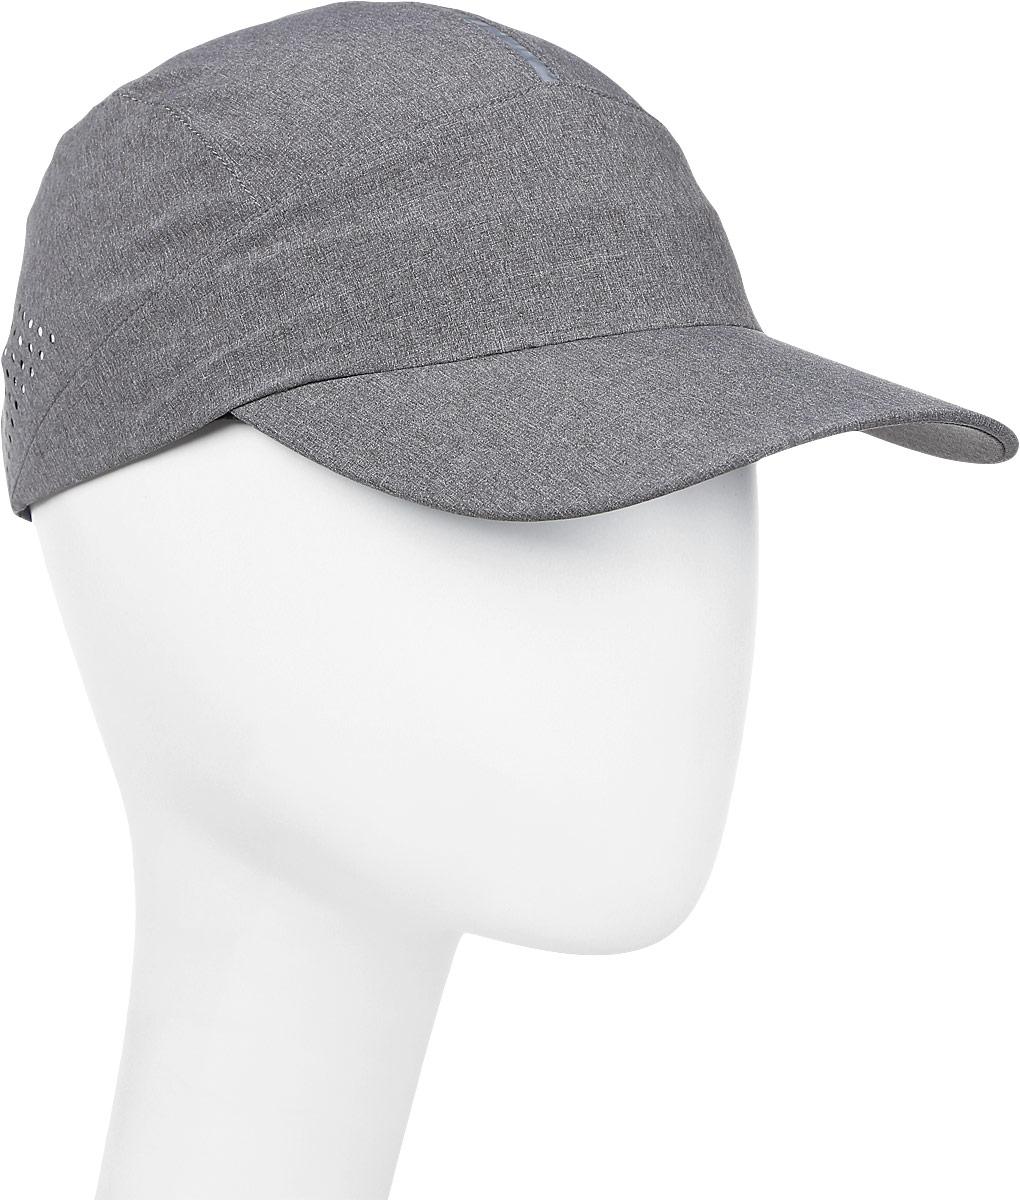 Бейсболка мужская Asics Running Cap, цвет: серый. 155010-0720. Размер 58 asics asics solid modified singlet page 1